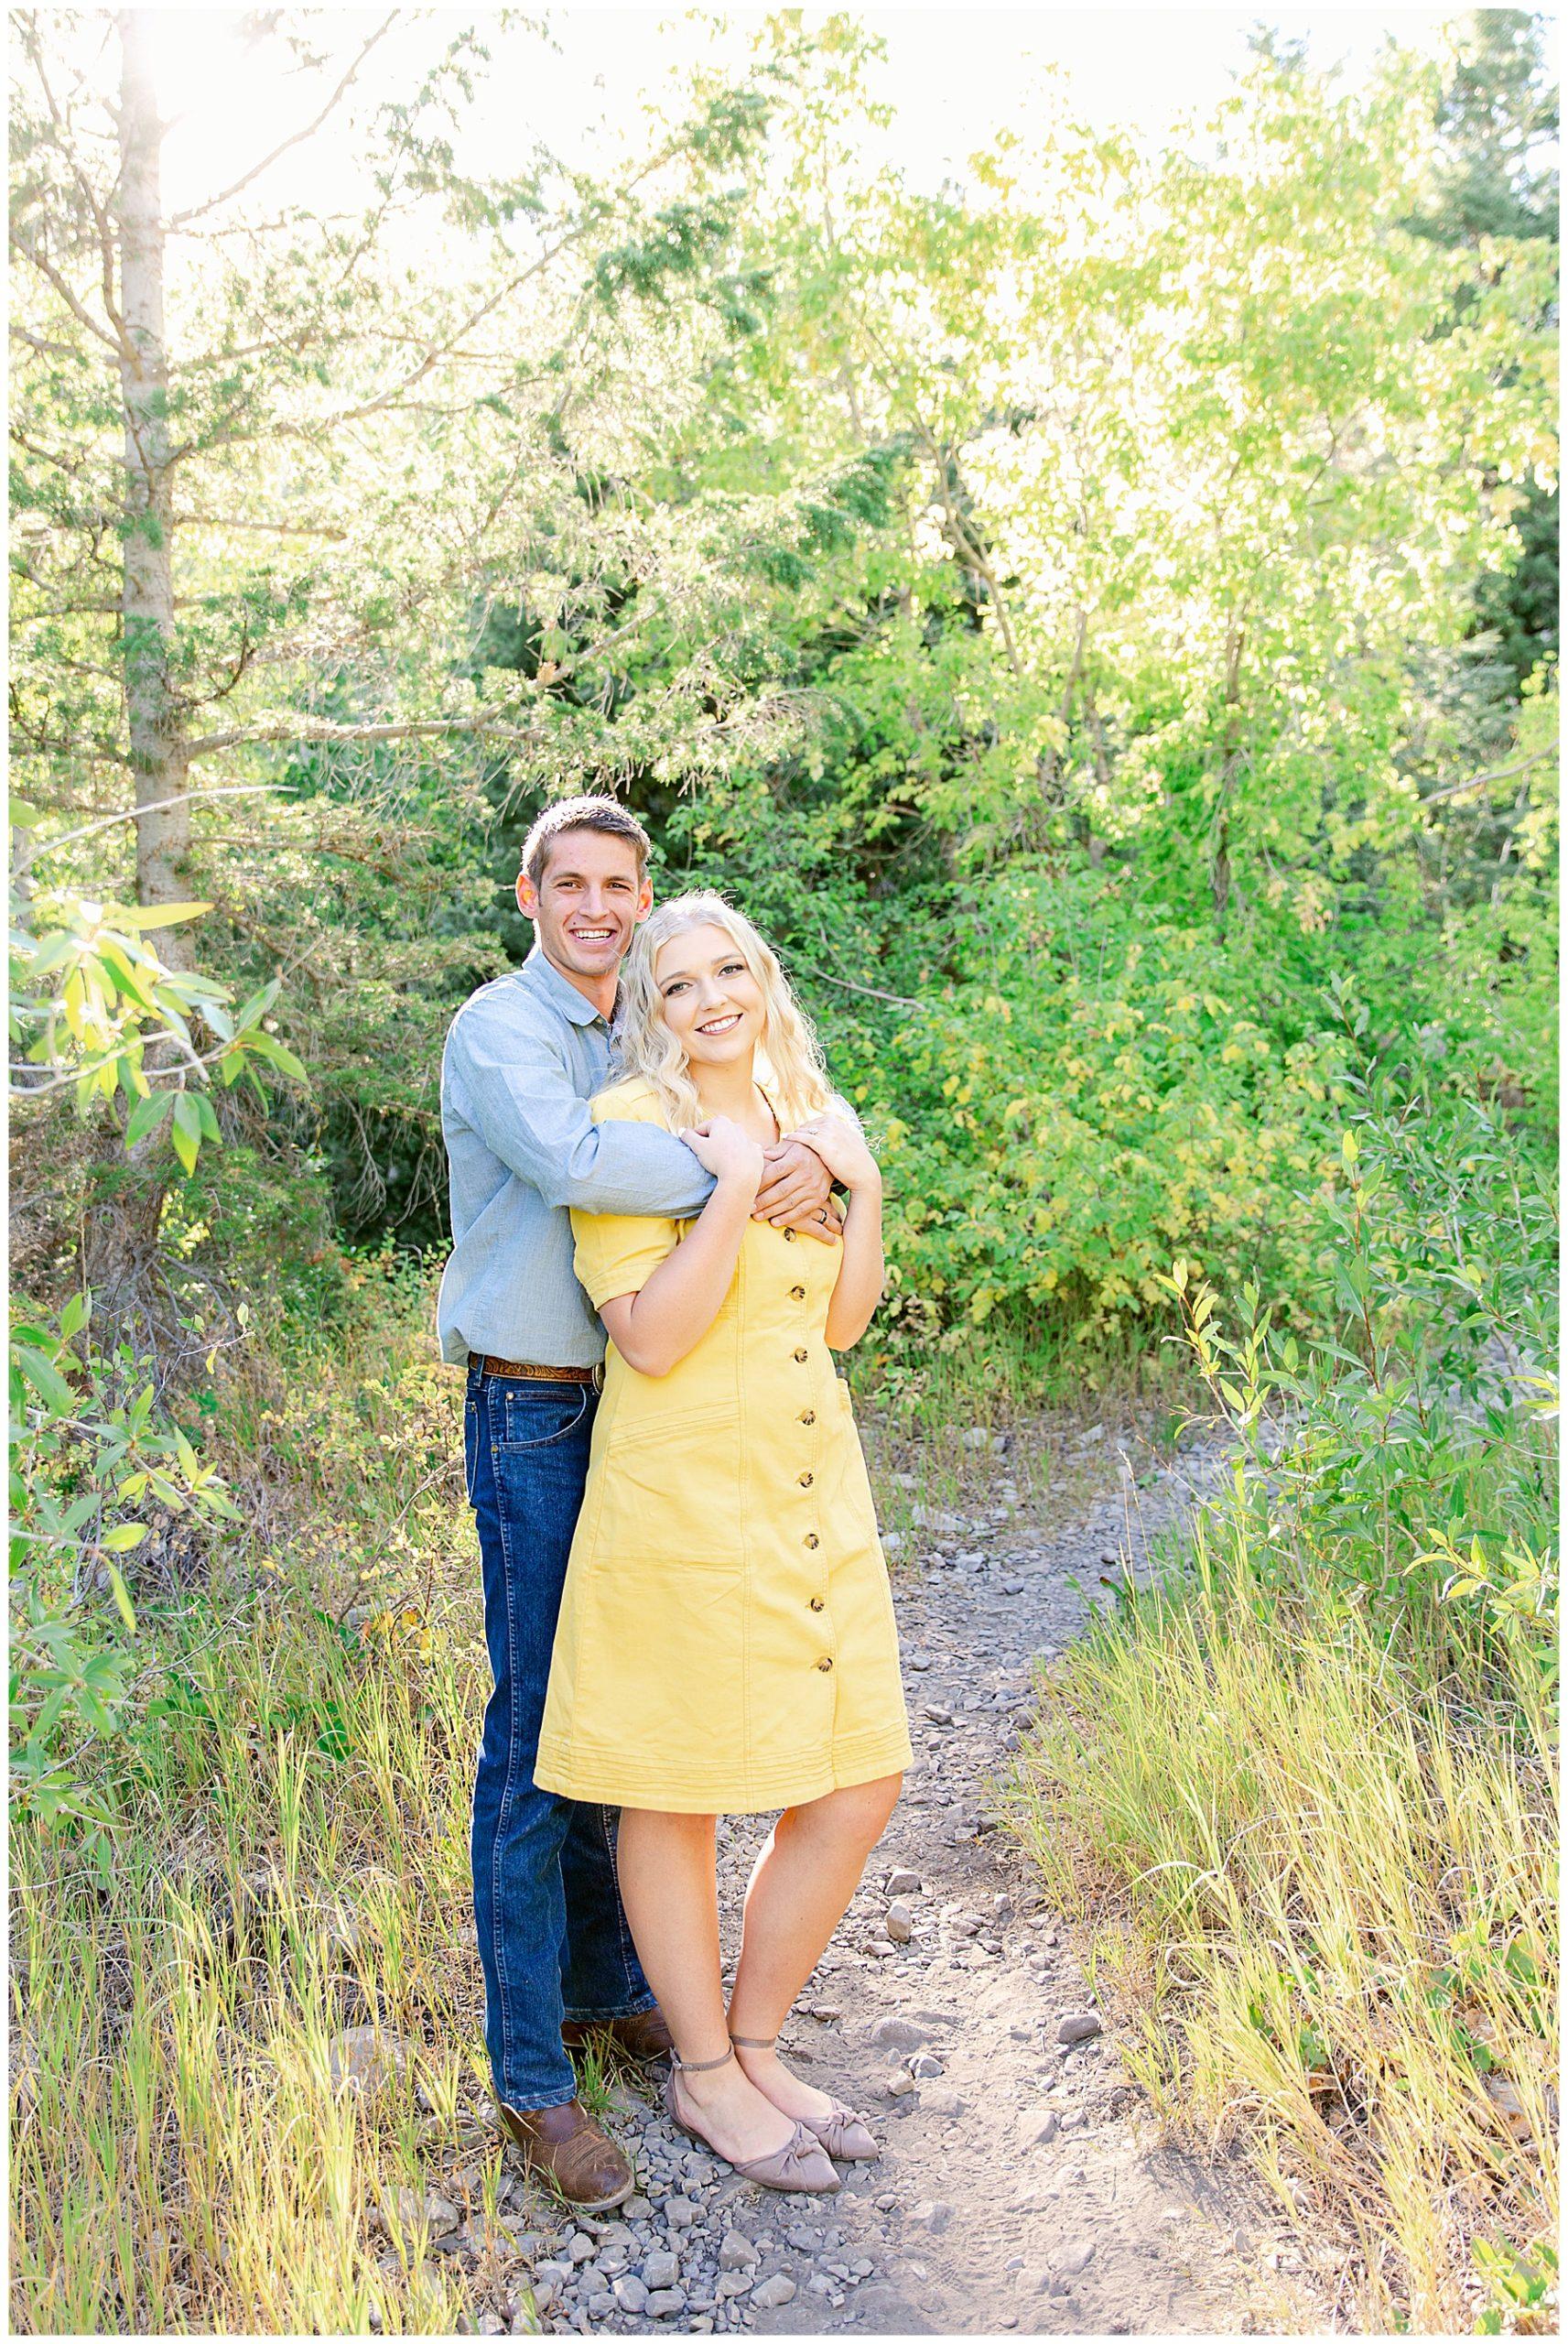 provo canyon engagements, aspen grove engagements, provo wedding photographer